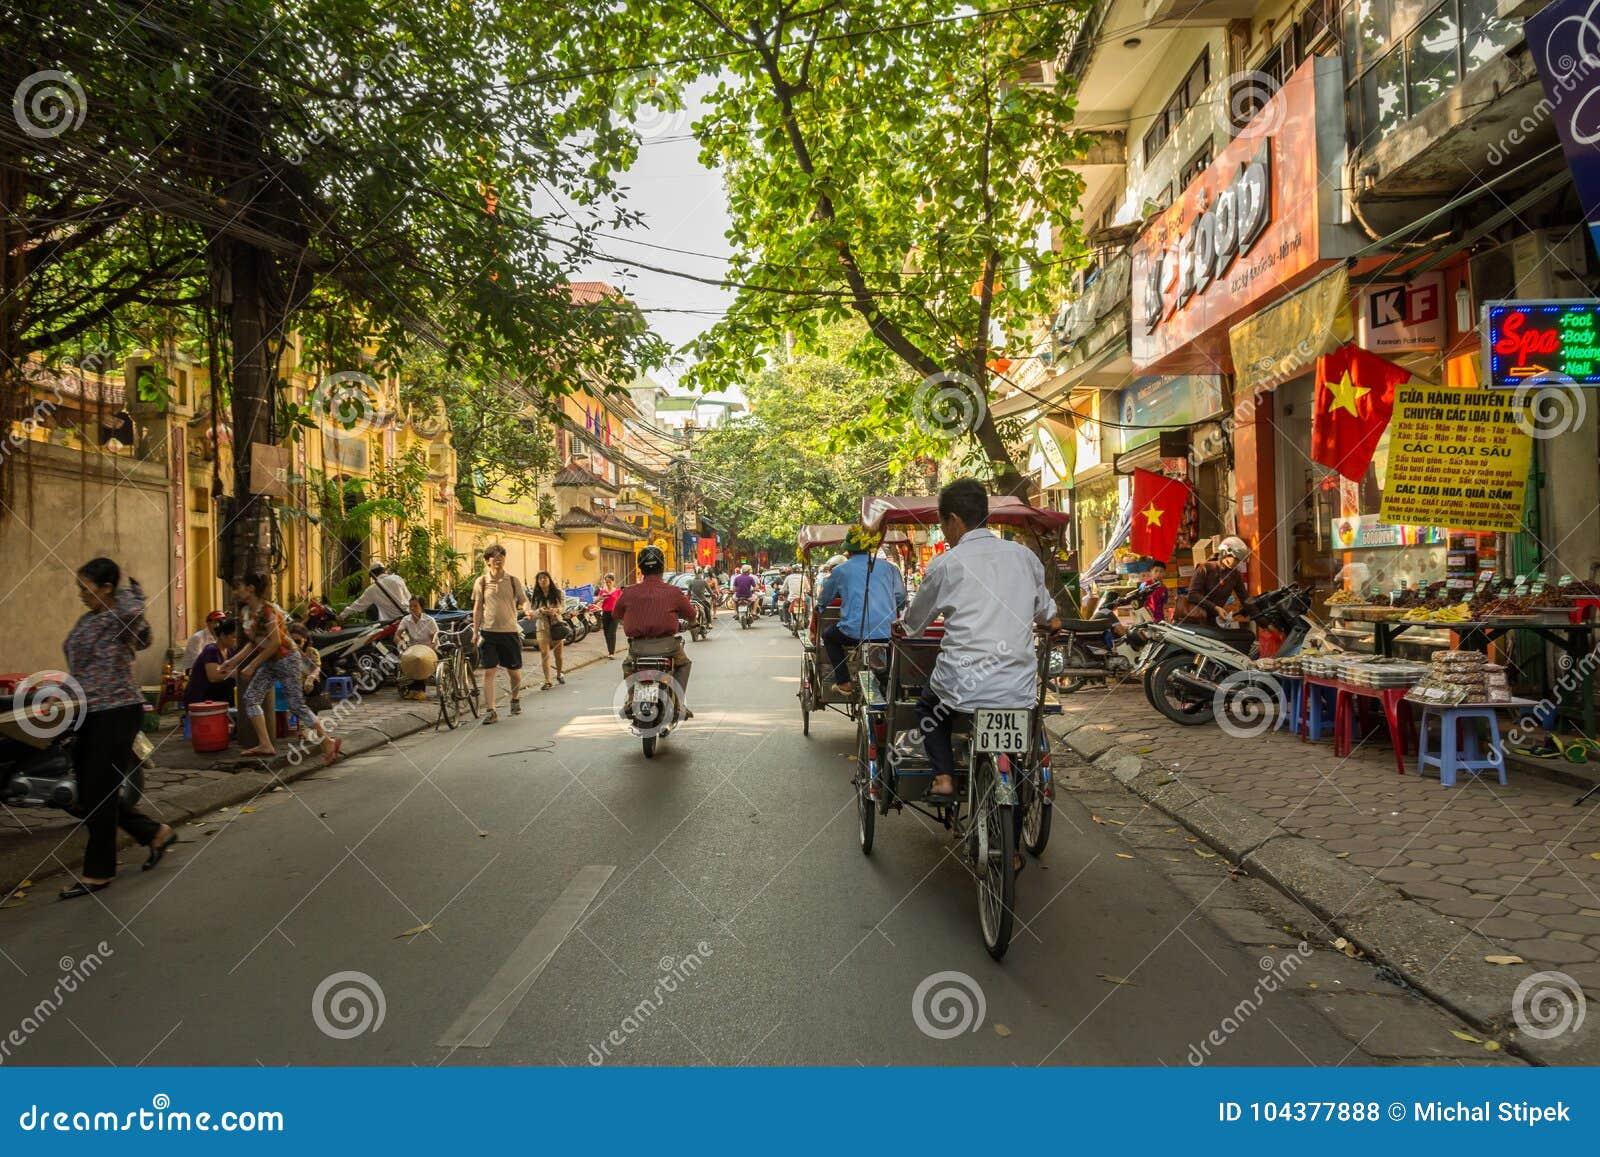 Rickshaw driver on busy street in Hanoi, Vietnam